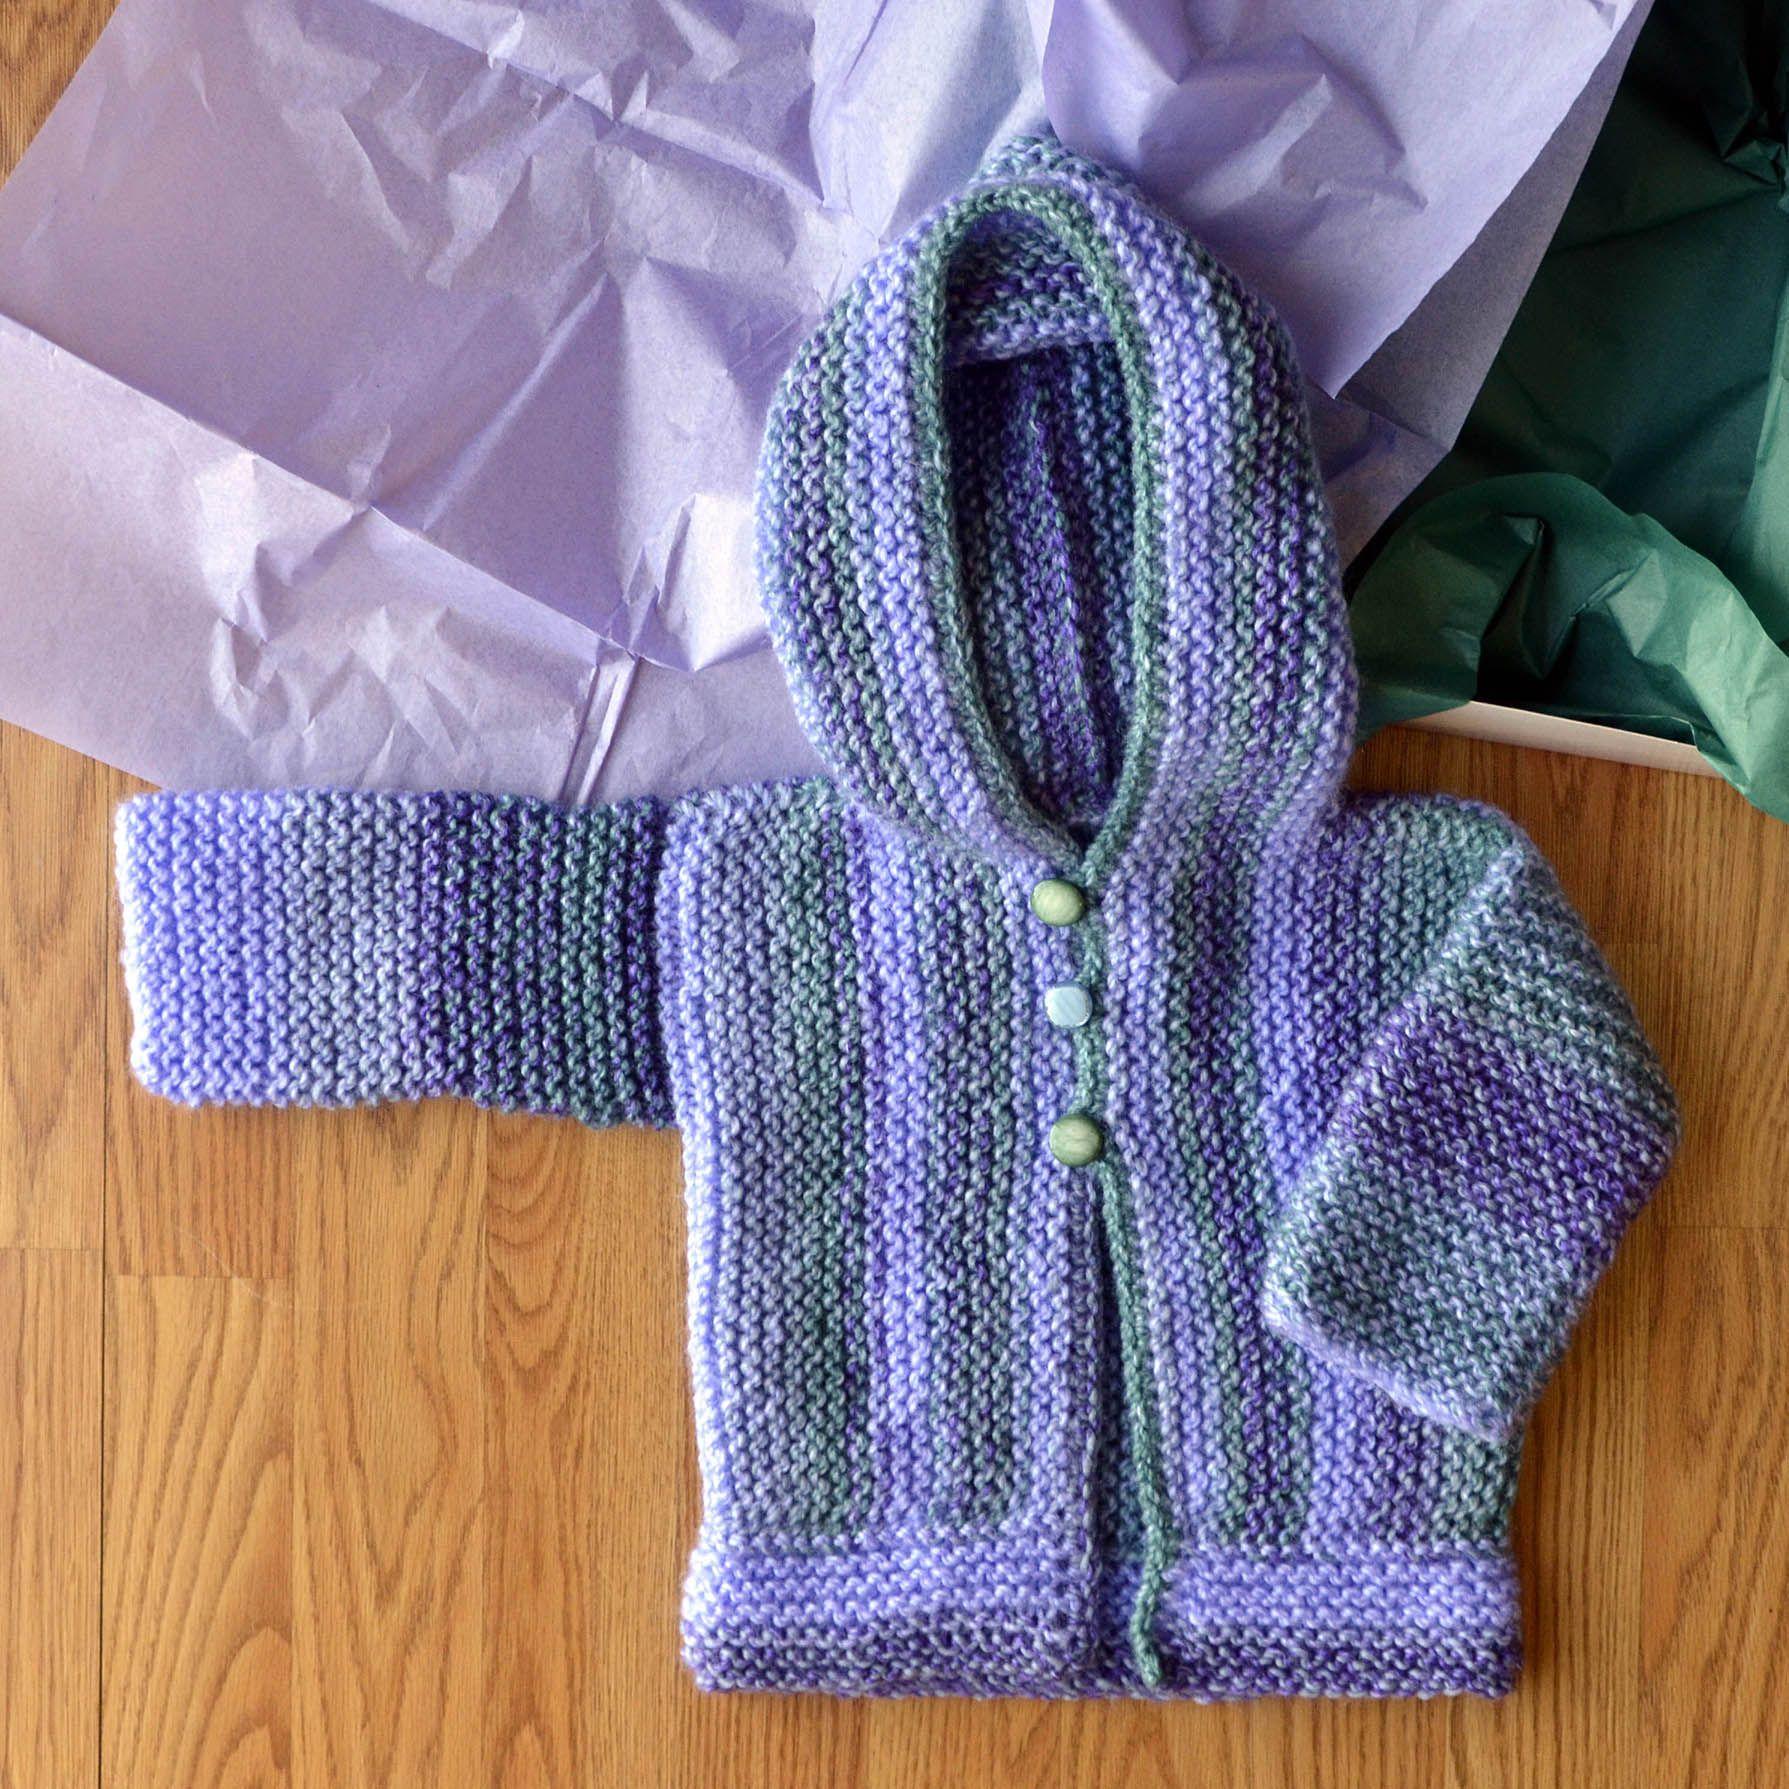 Free Pattern Friday - Cozy Cardi knit in Universal Yarn Major | baby ...